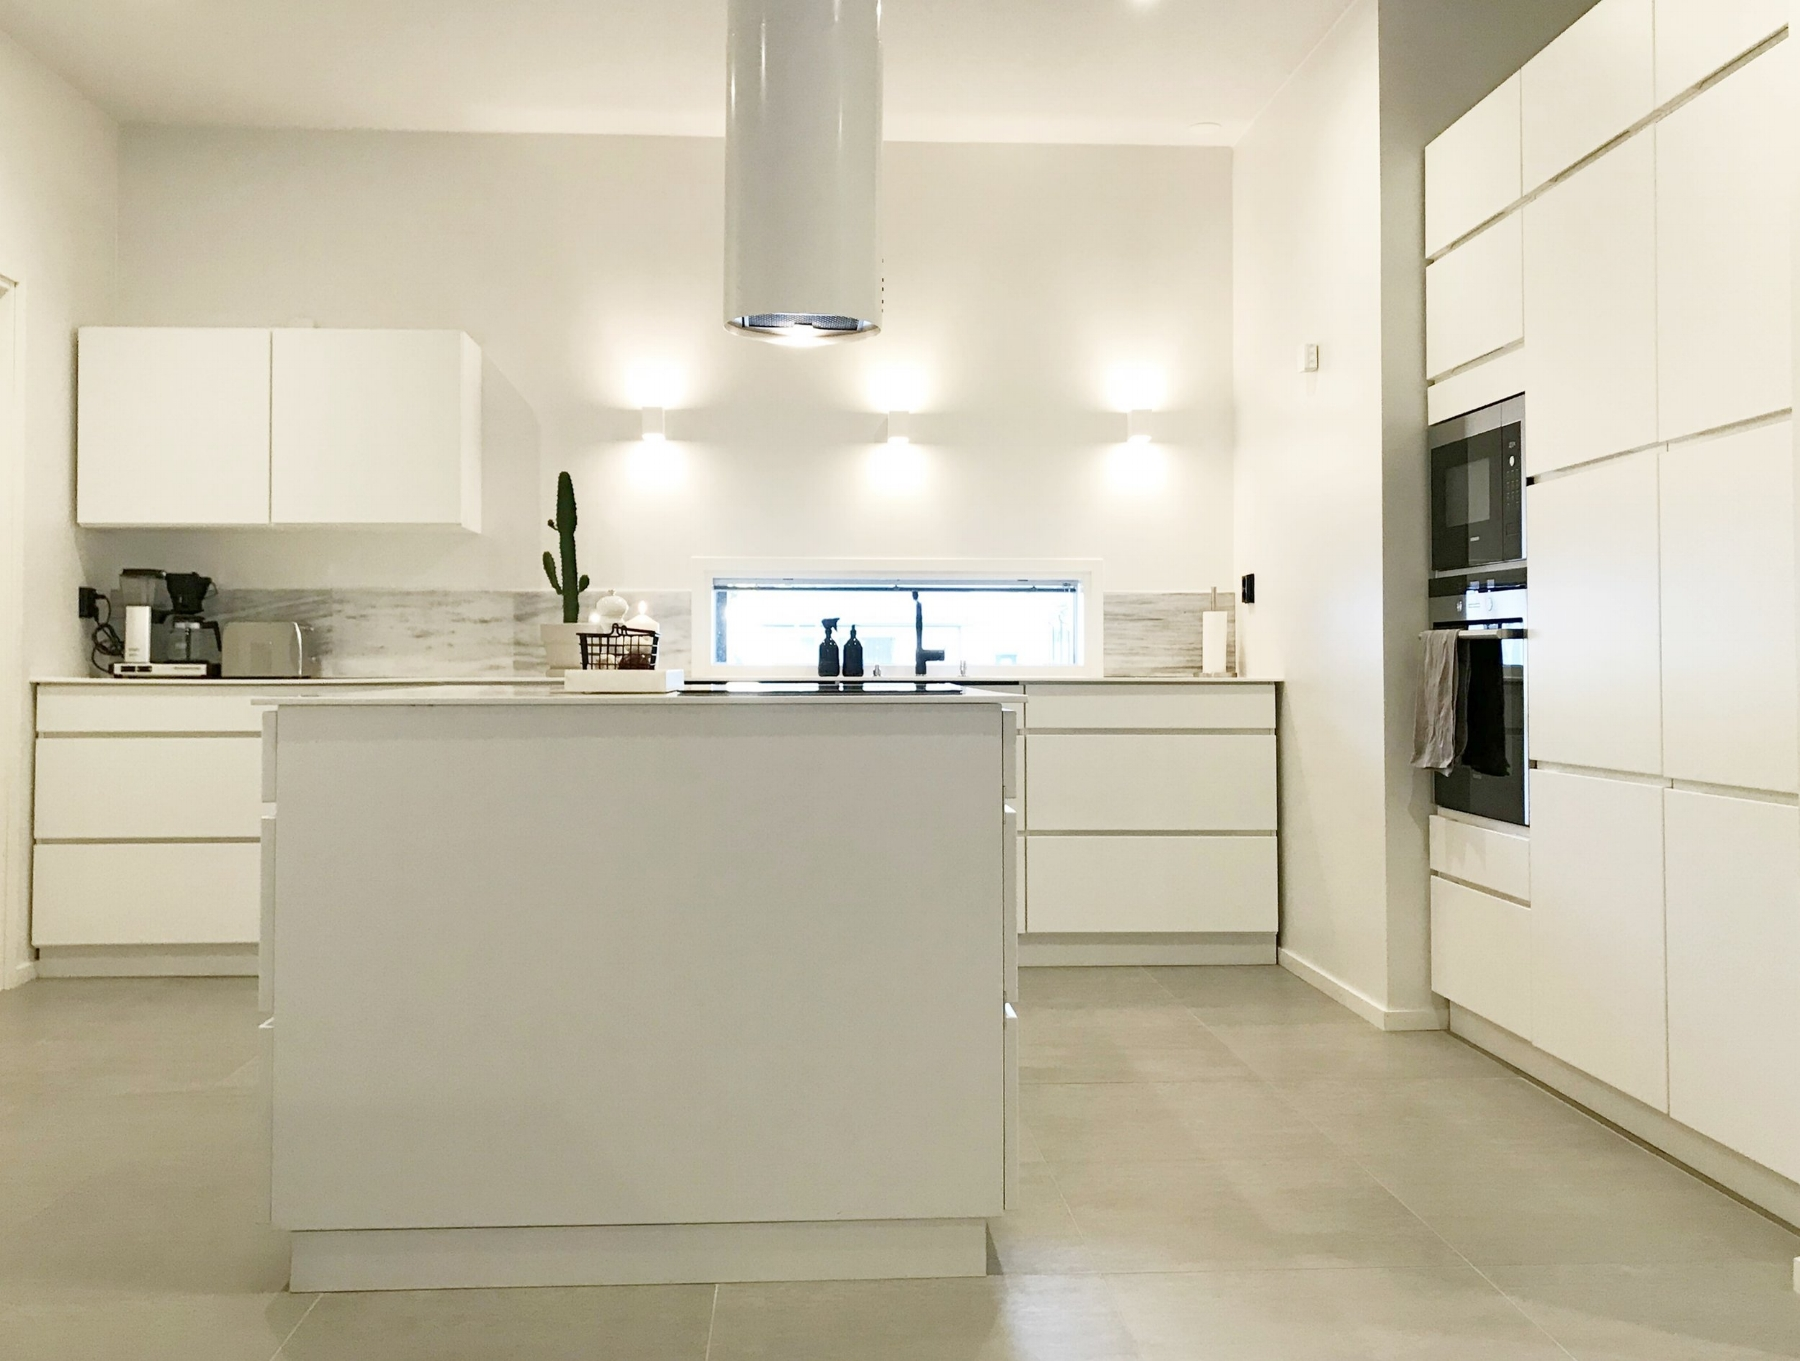 keittiö5.jpg